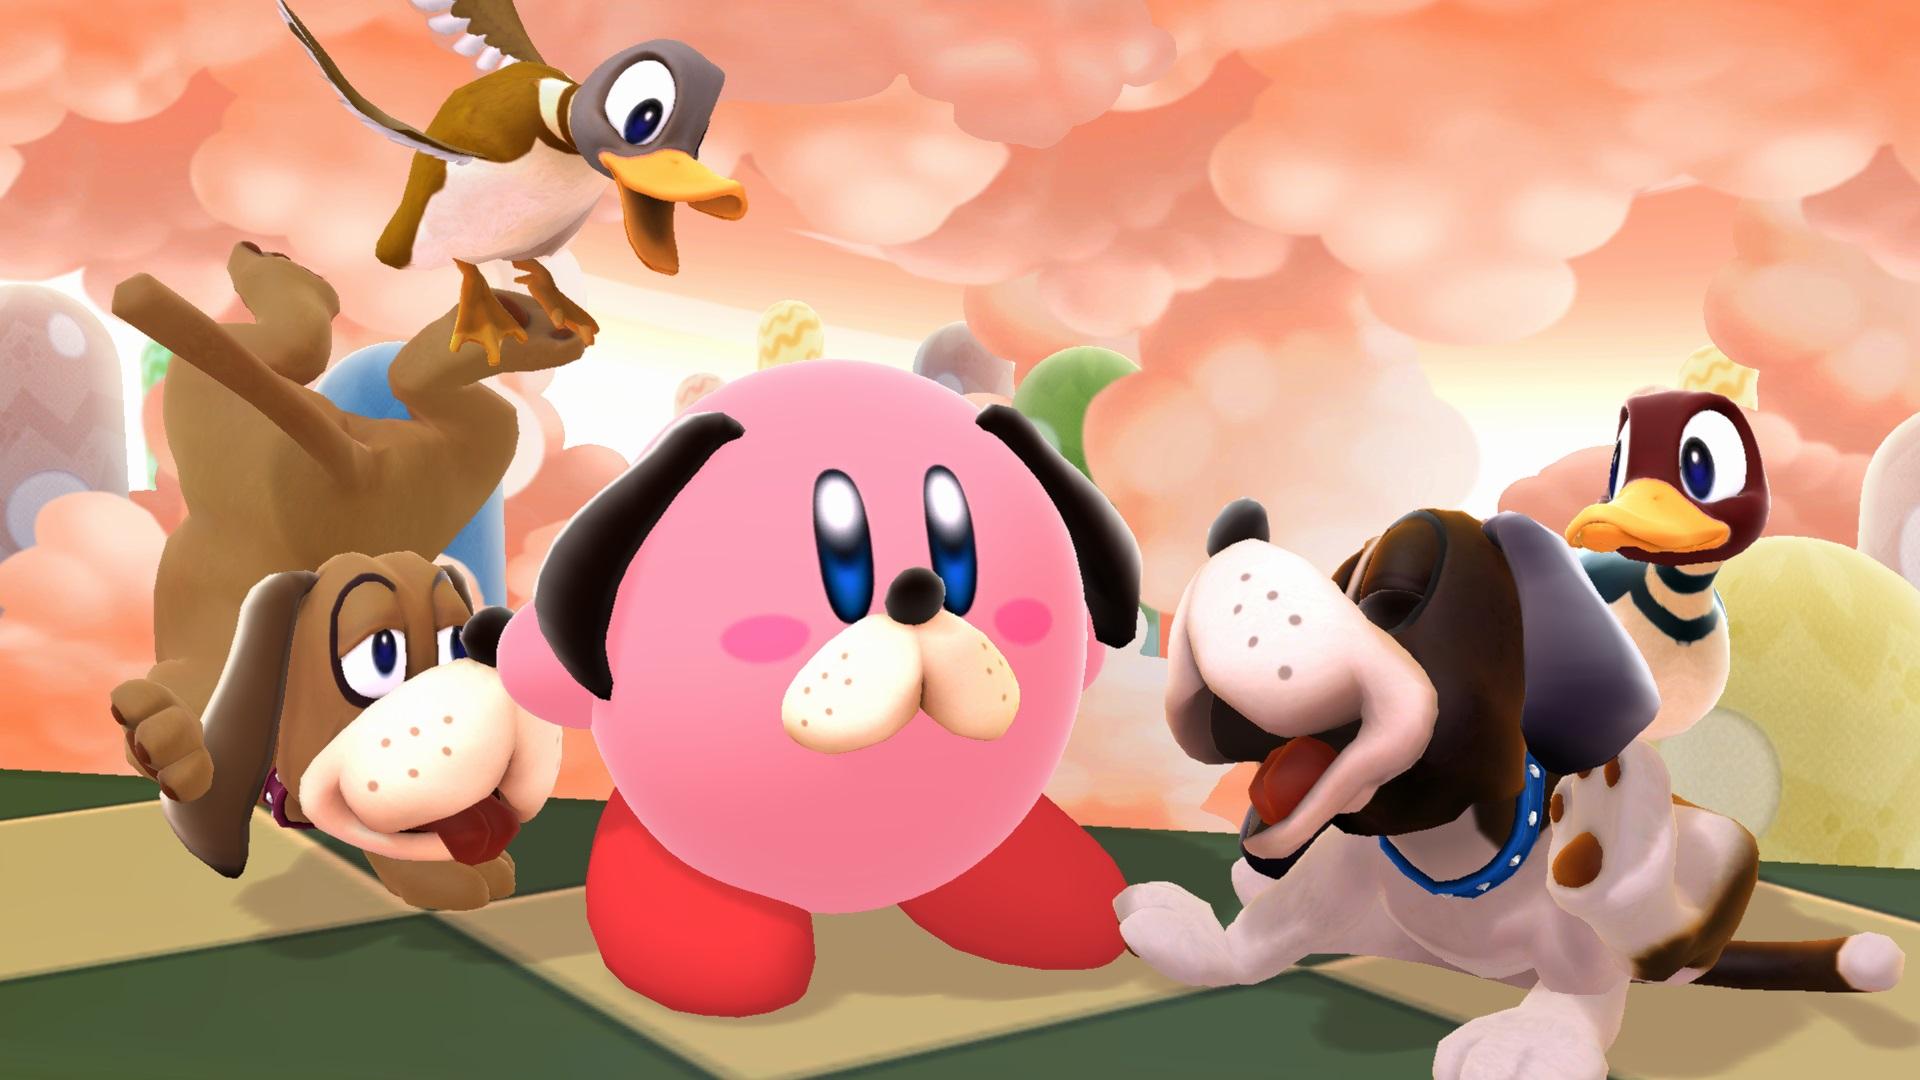 Sakurai Explains Duck Hunt's Appearance in Smash Bros. - opr